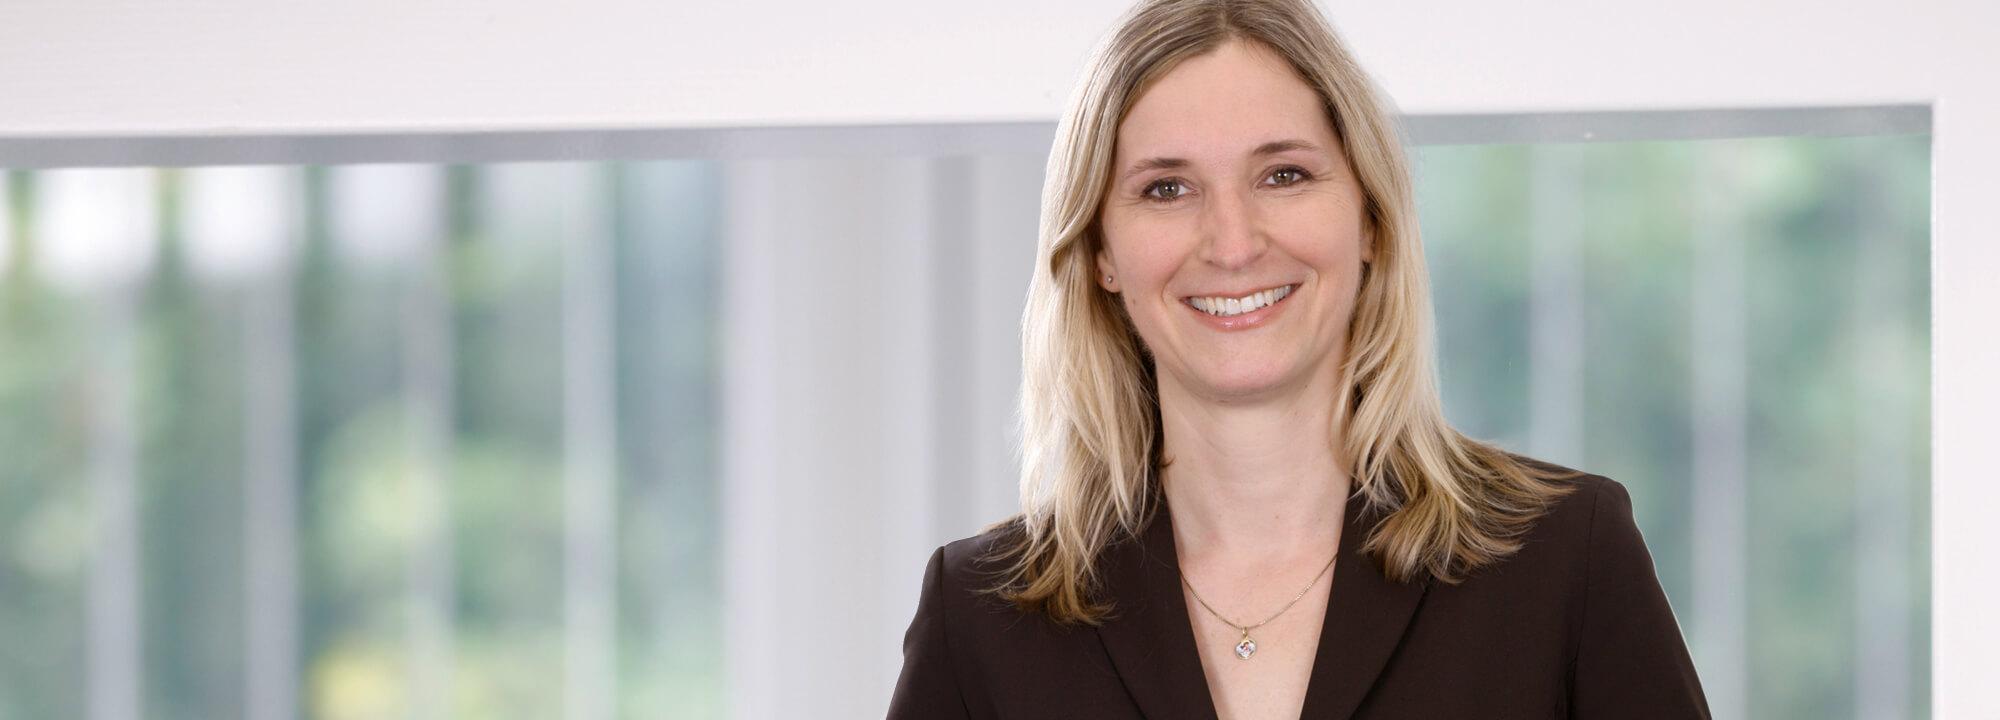 cbs-wurde-ende-november-mitglied-bei-un-global-compact-interview-mit-prof-dr-lisa-froelich